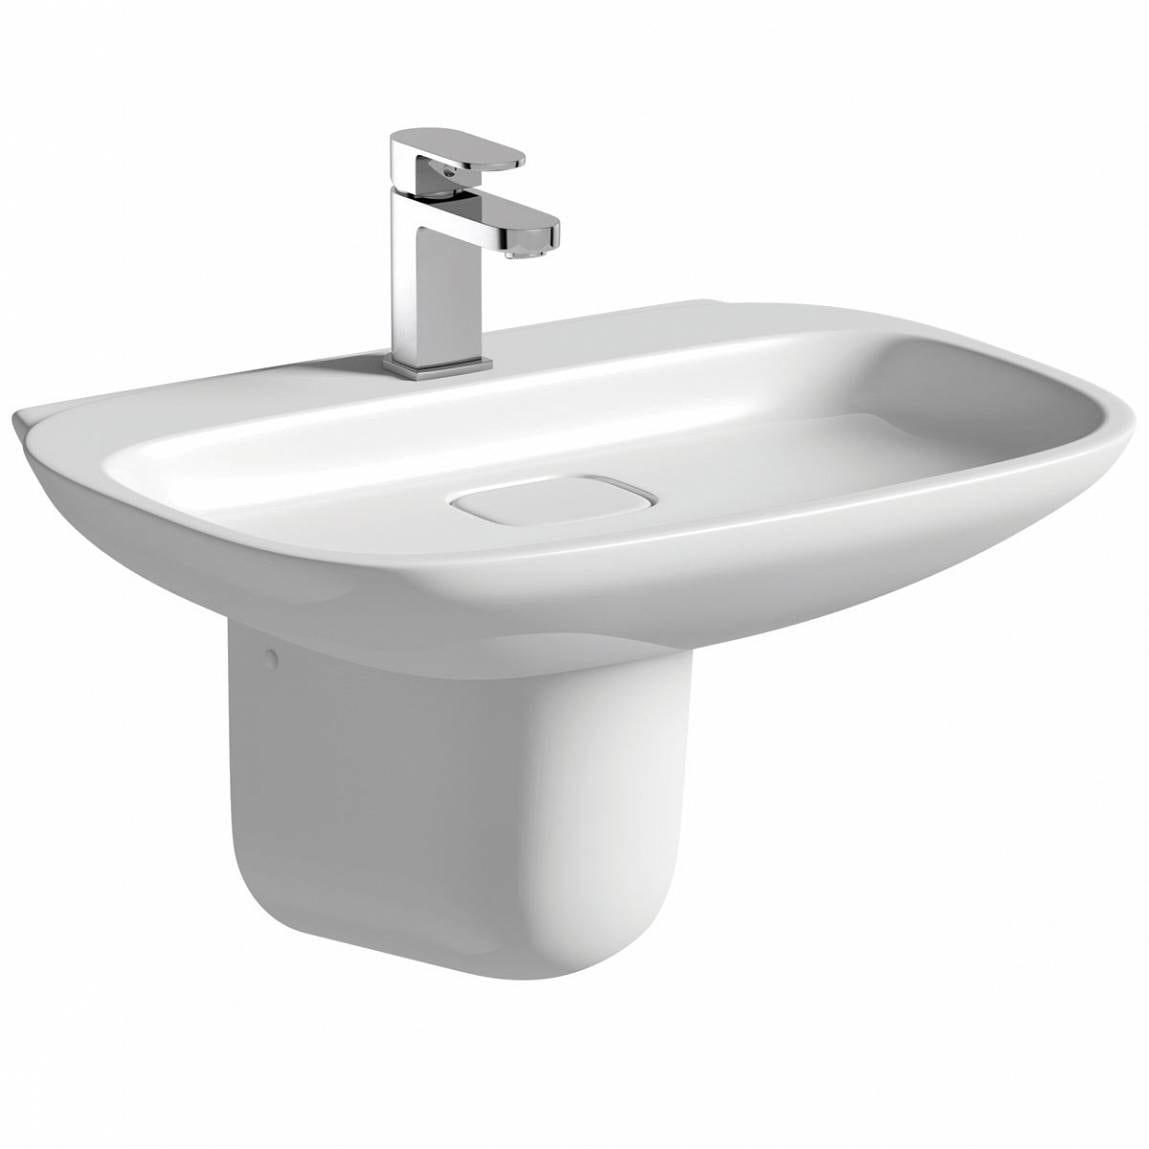 Mode Heath 1 tap hole semi pedestal basin 600mm